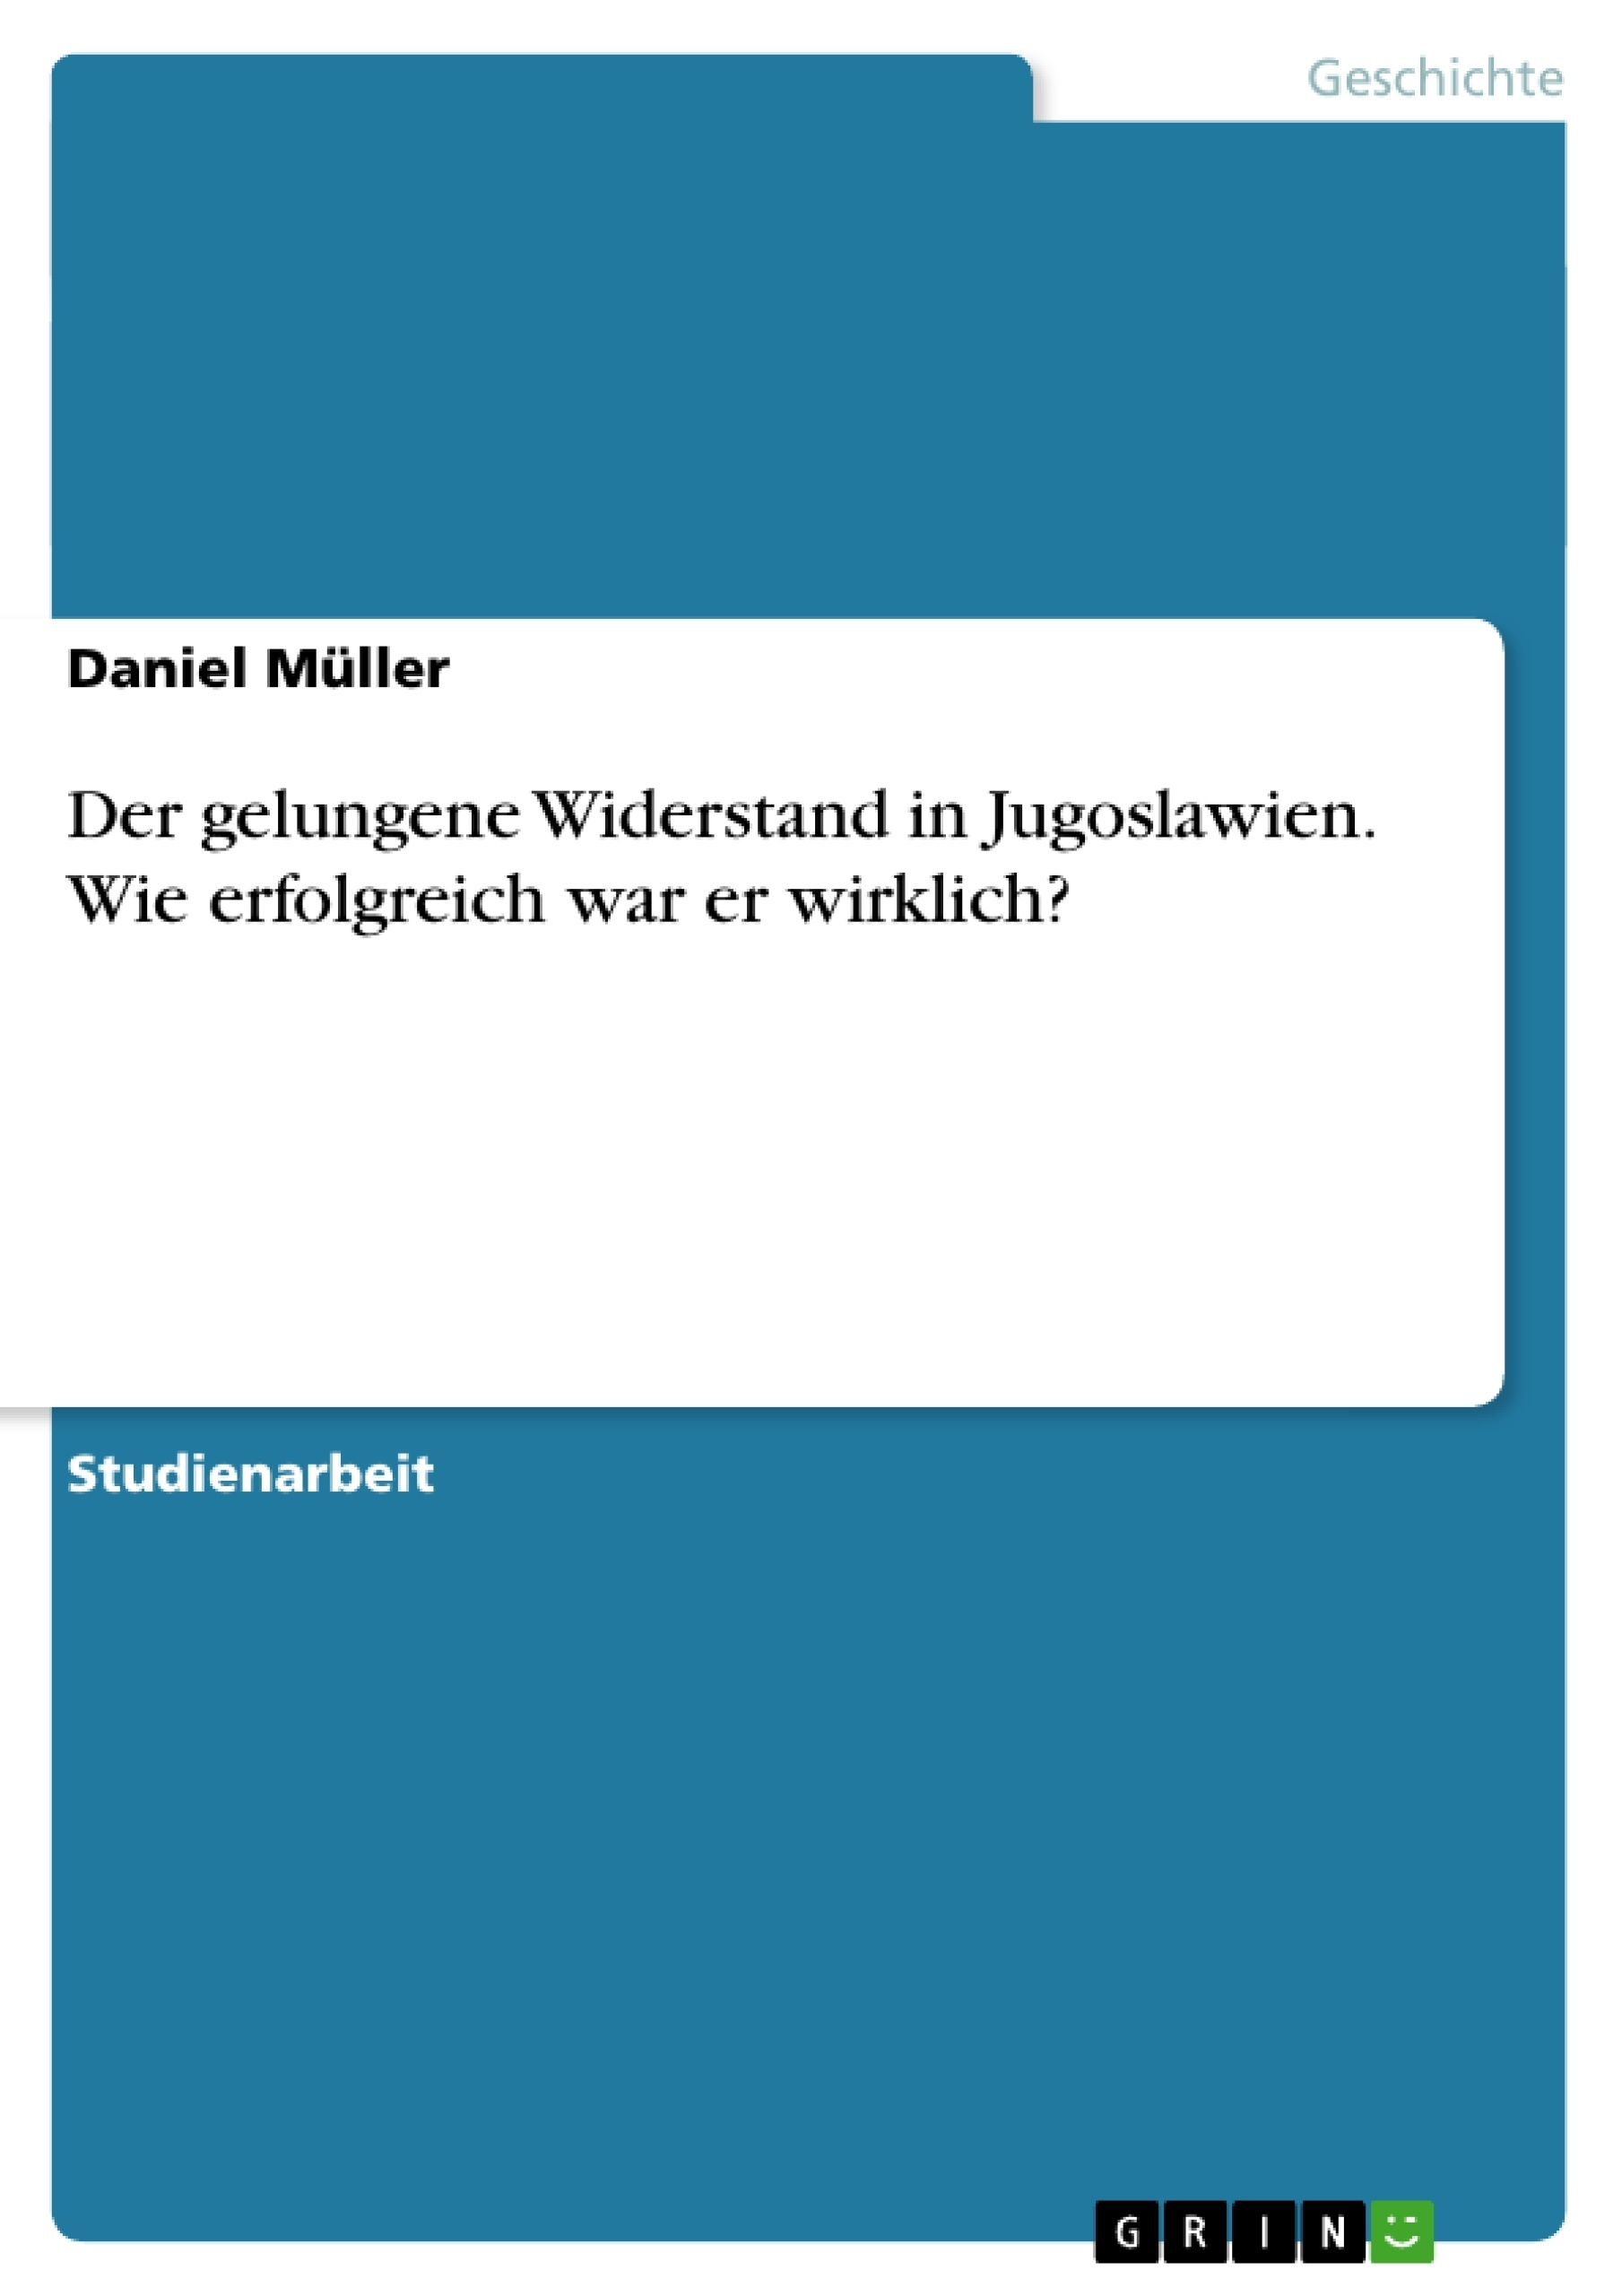 World war ii essay